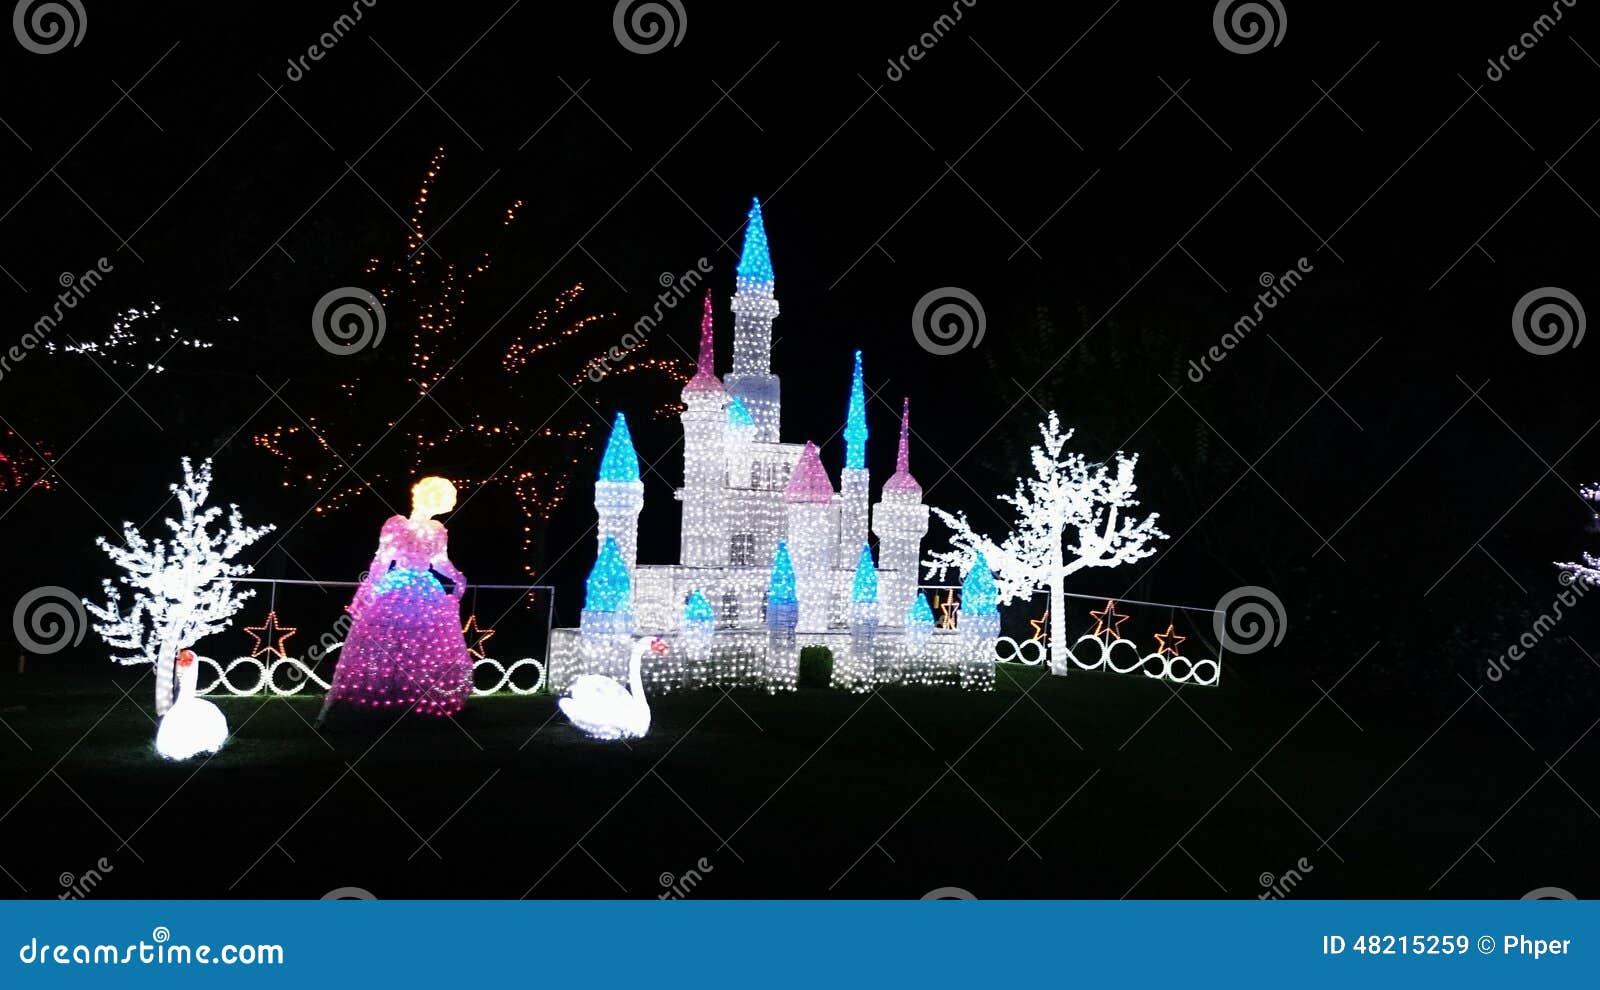 Cinderella Castle Christmas Lights.Christmas Light Show Cinderella And Castle Editorial Stock